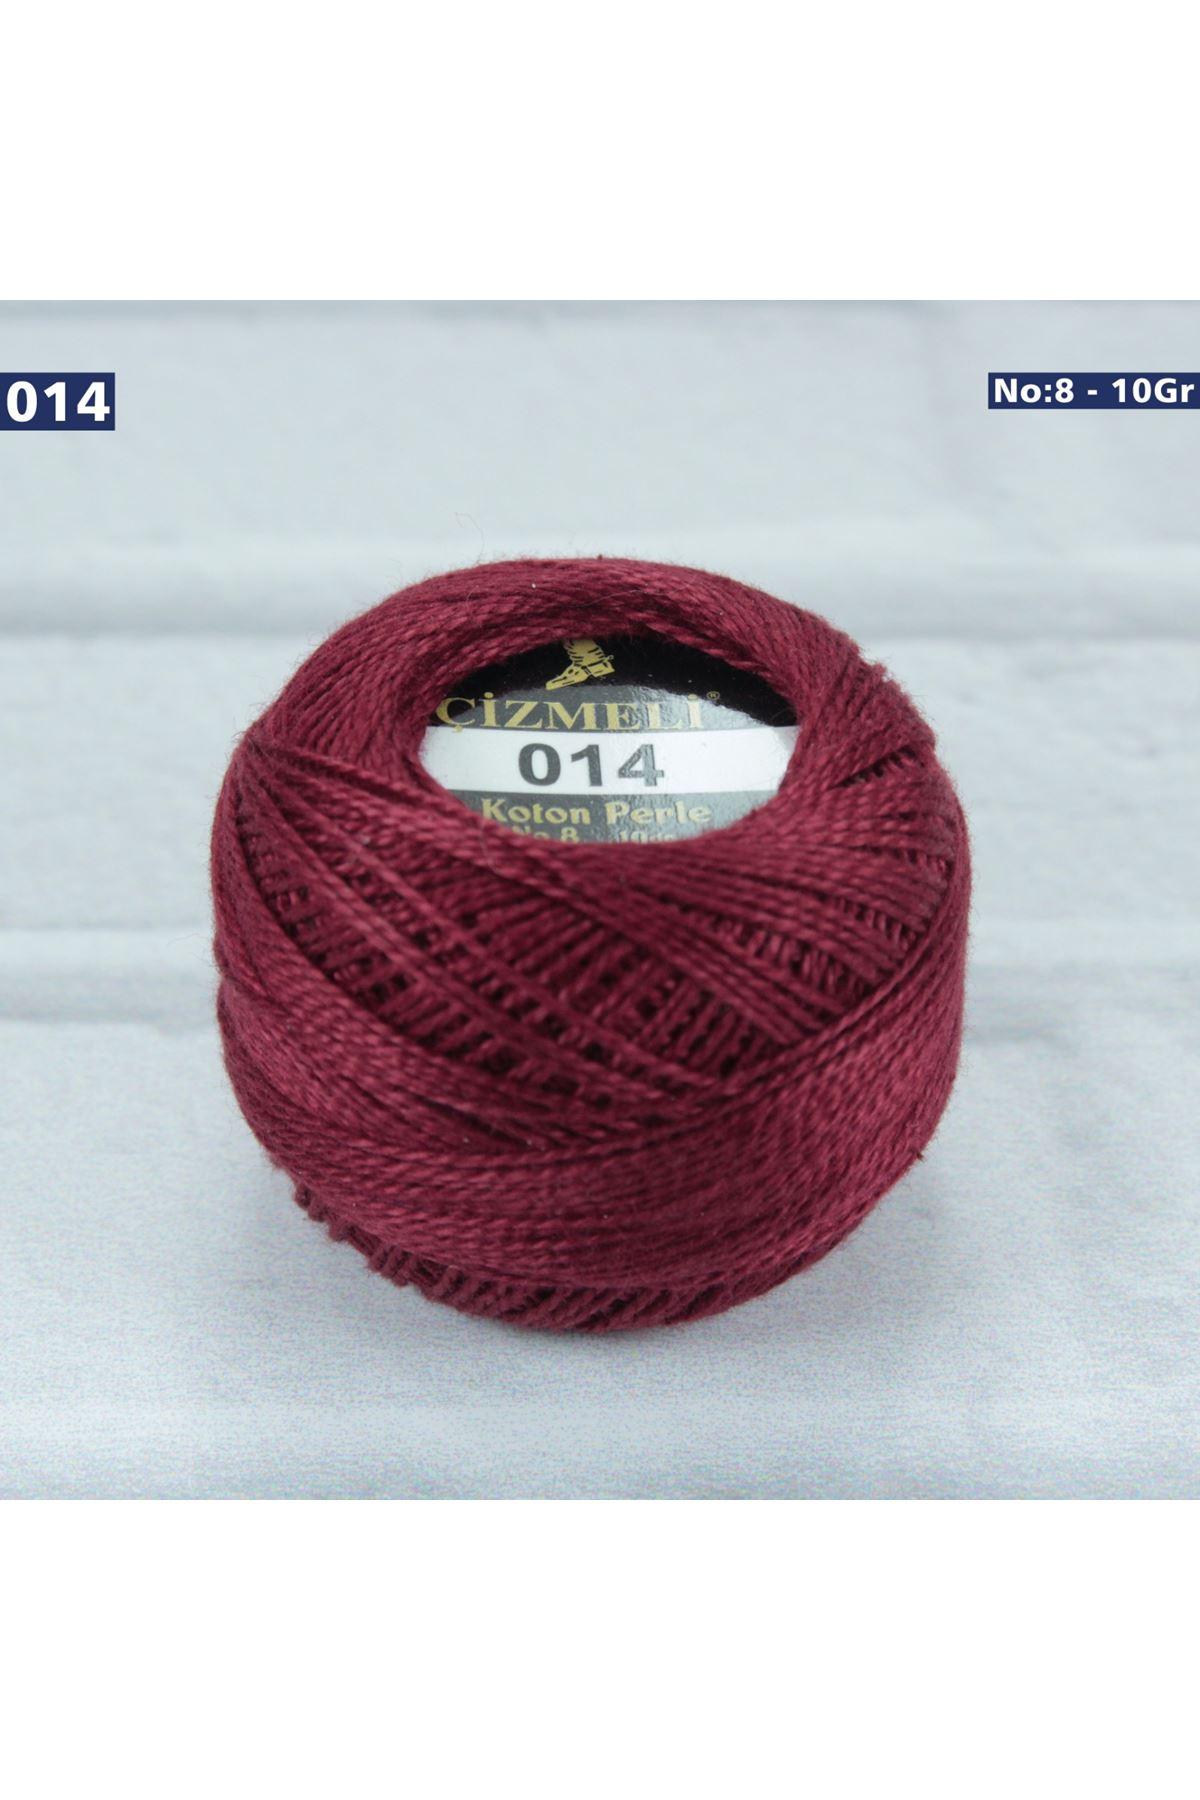 Çizmeli Cotton Perle Nakış İpliği No: 014